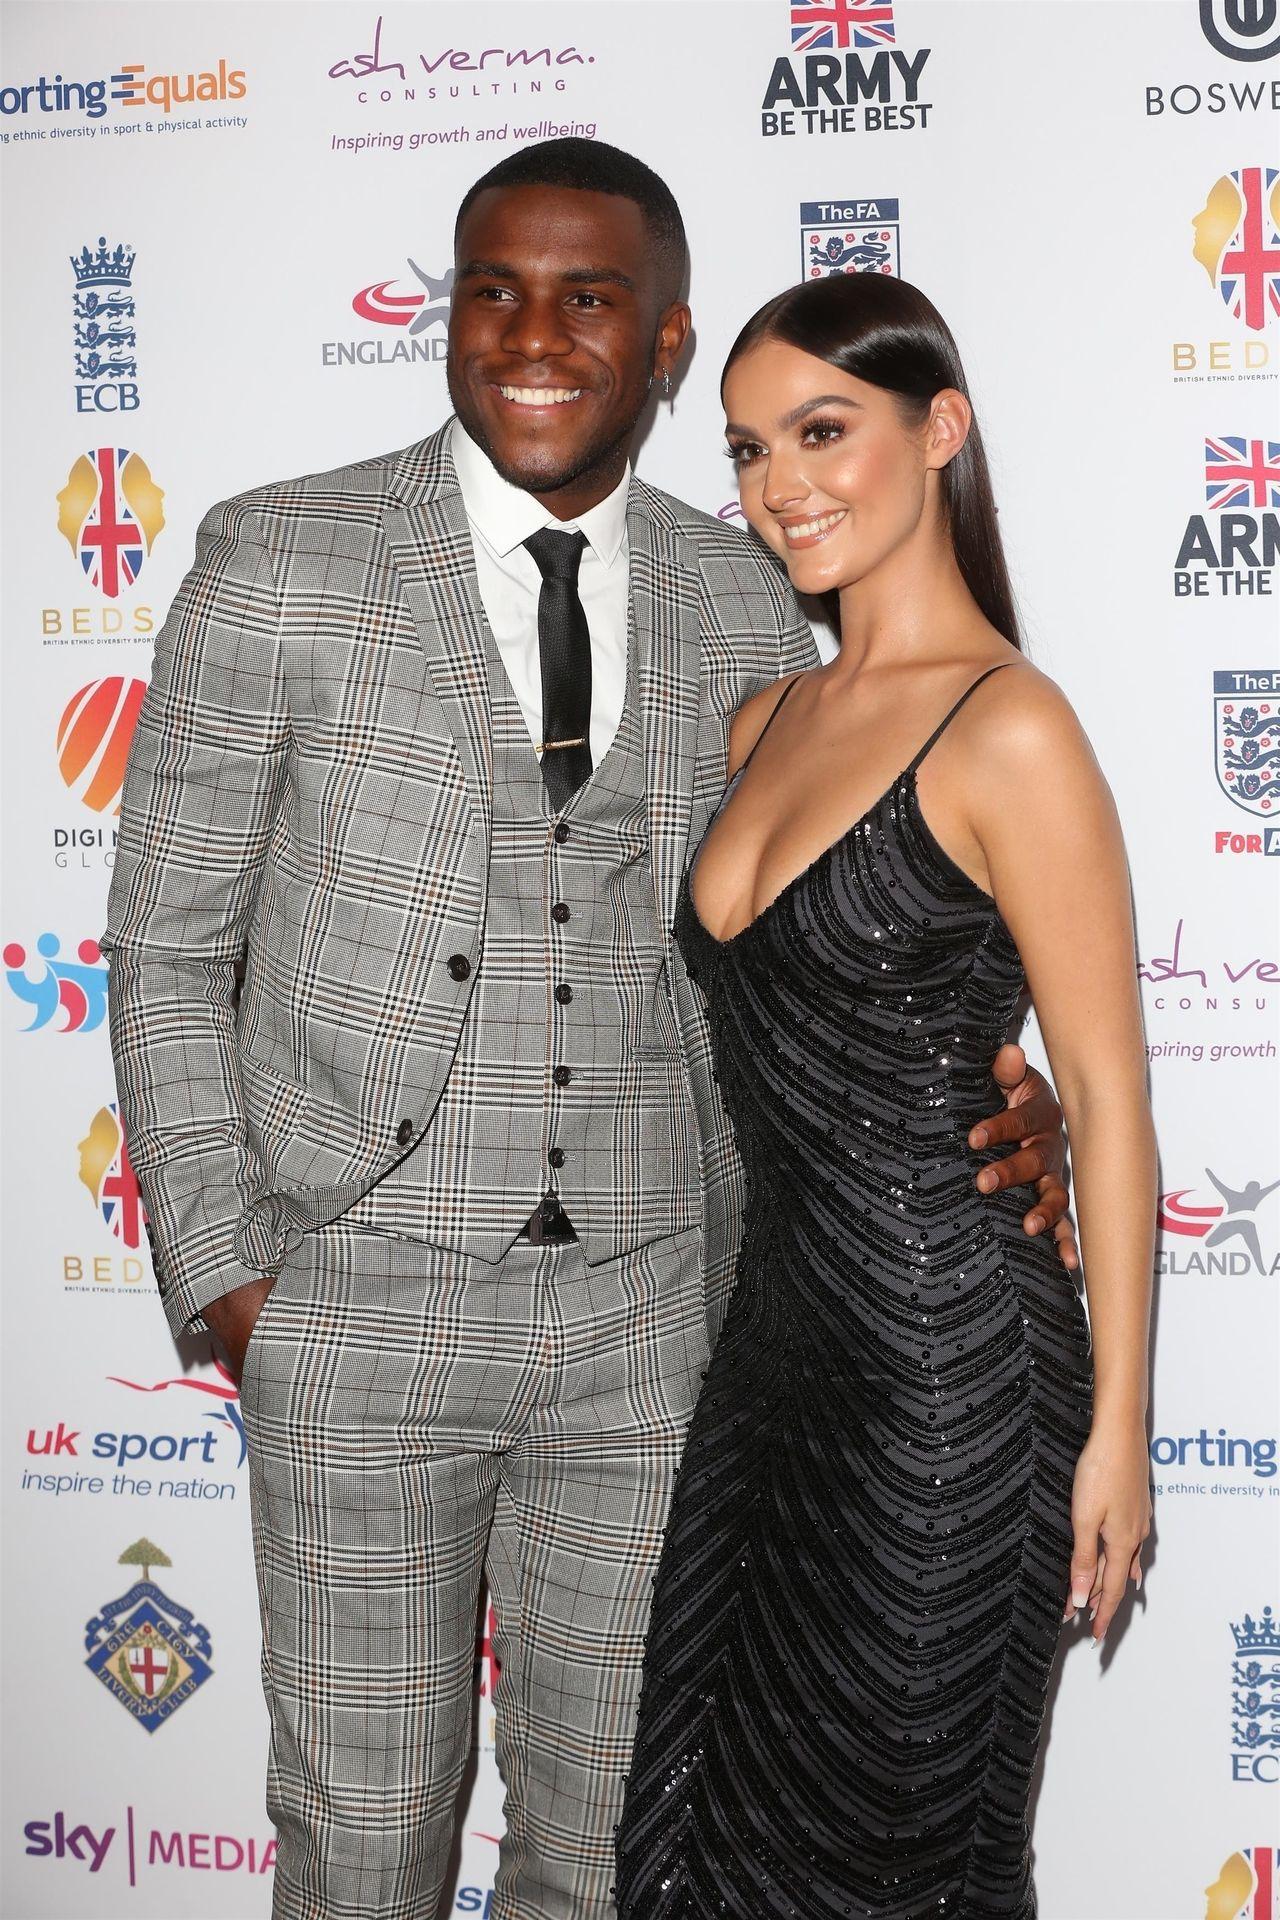 Siannise Fudge & Luke Trotman Are Seen At British Ethnic Diversity Sports Awards 0060